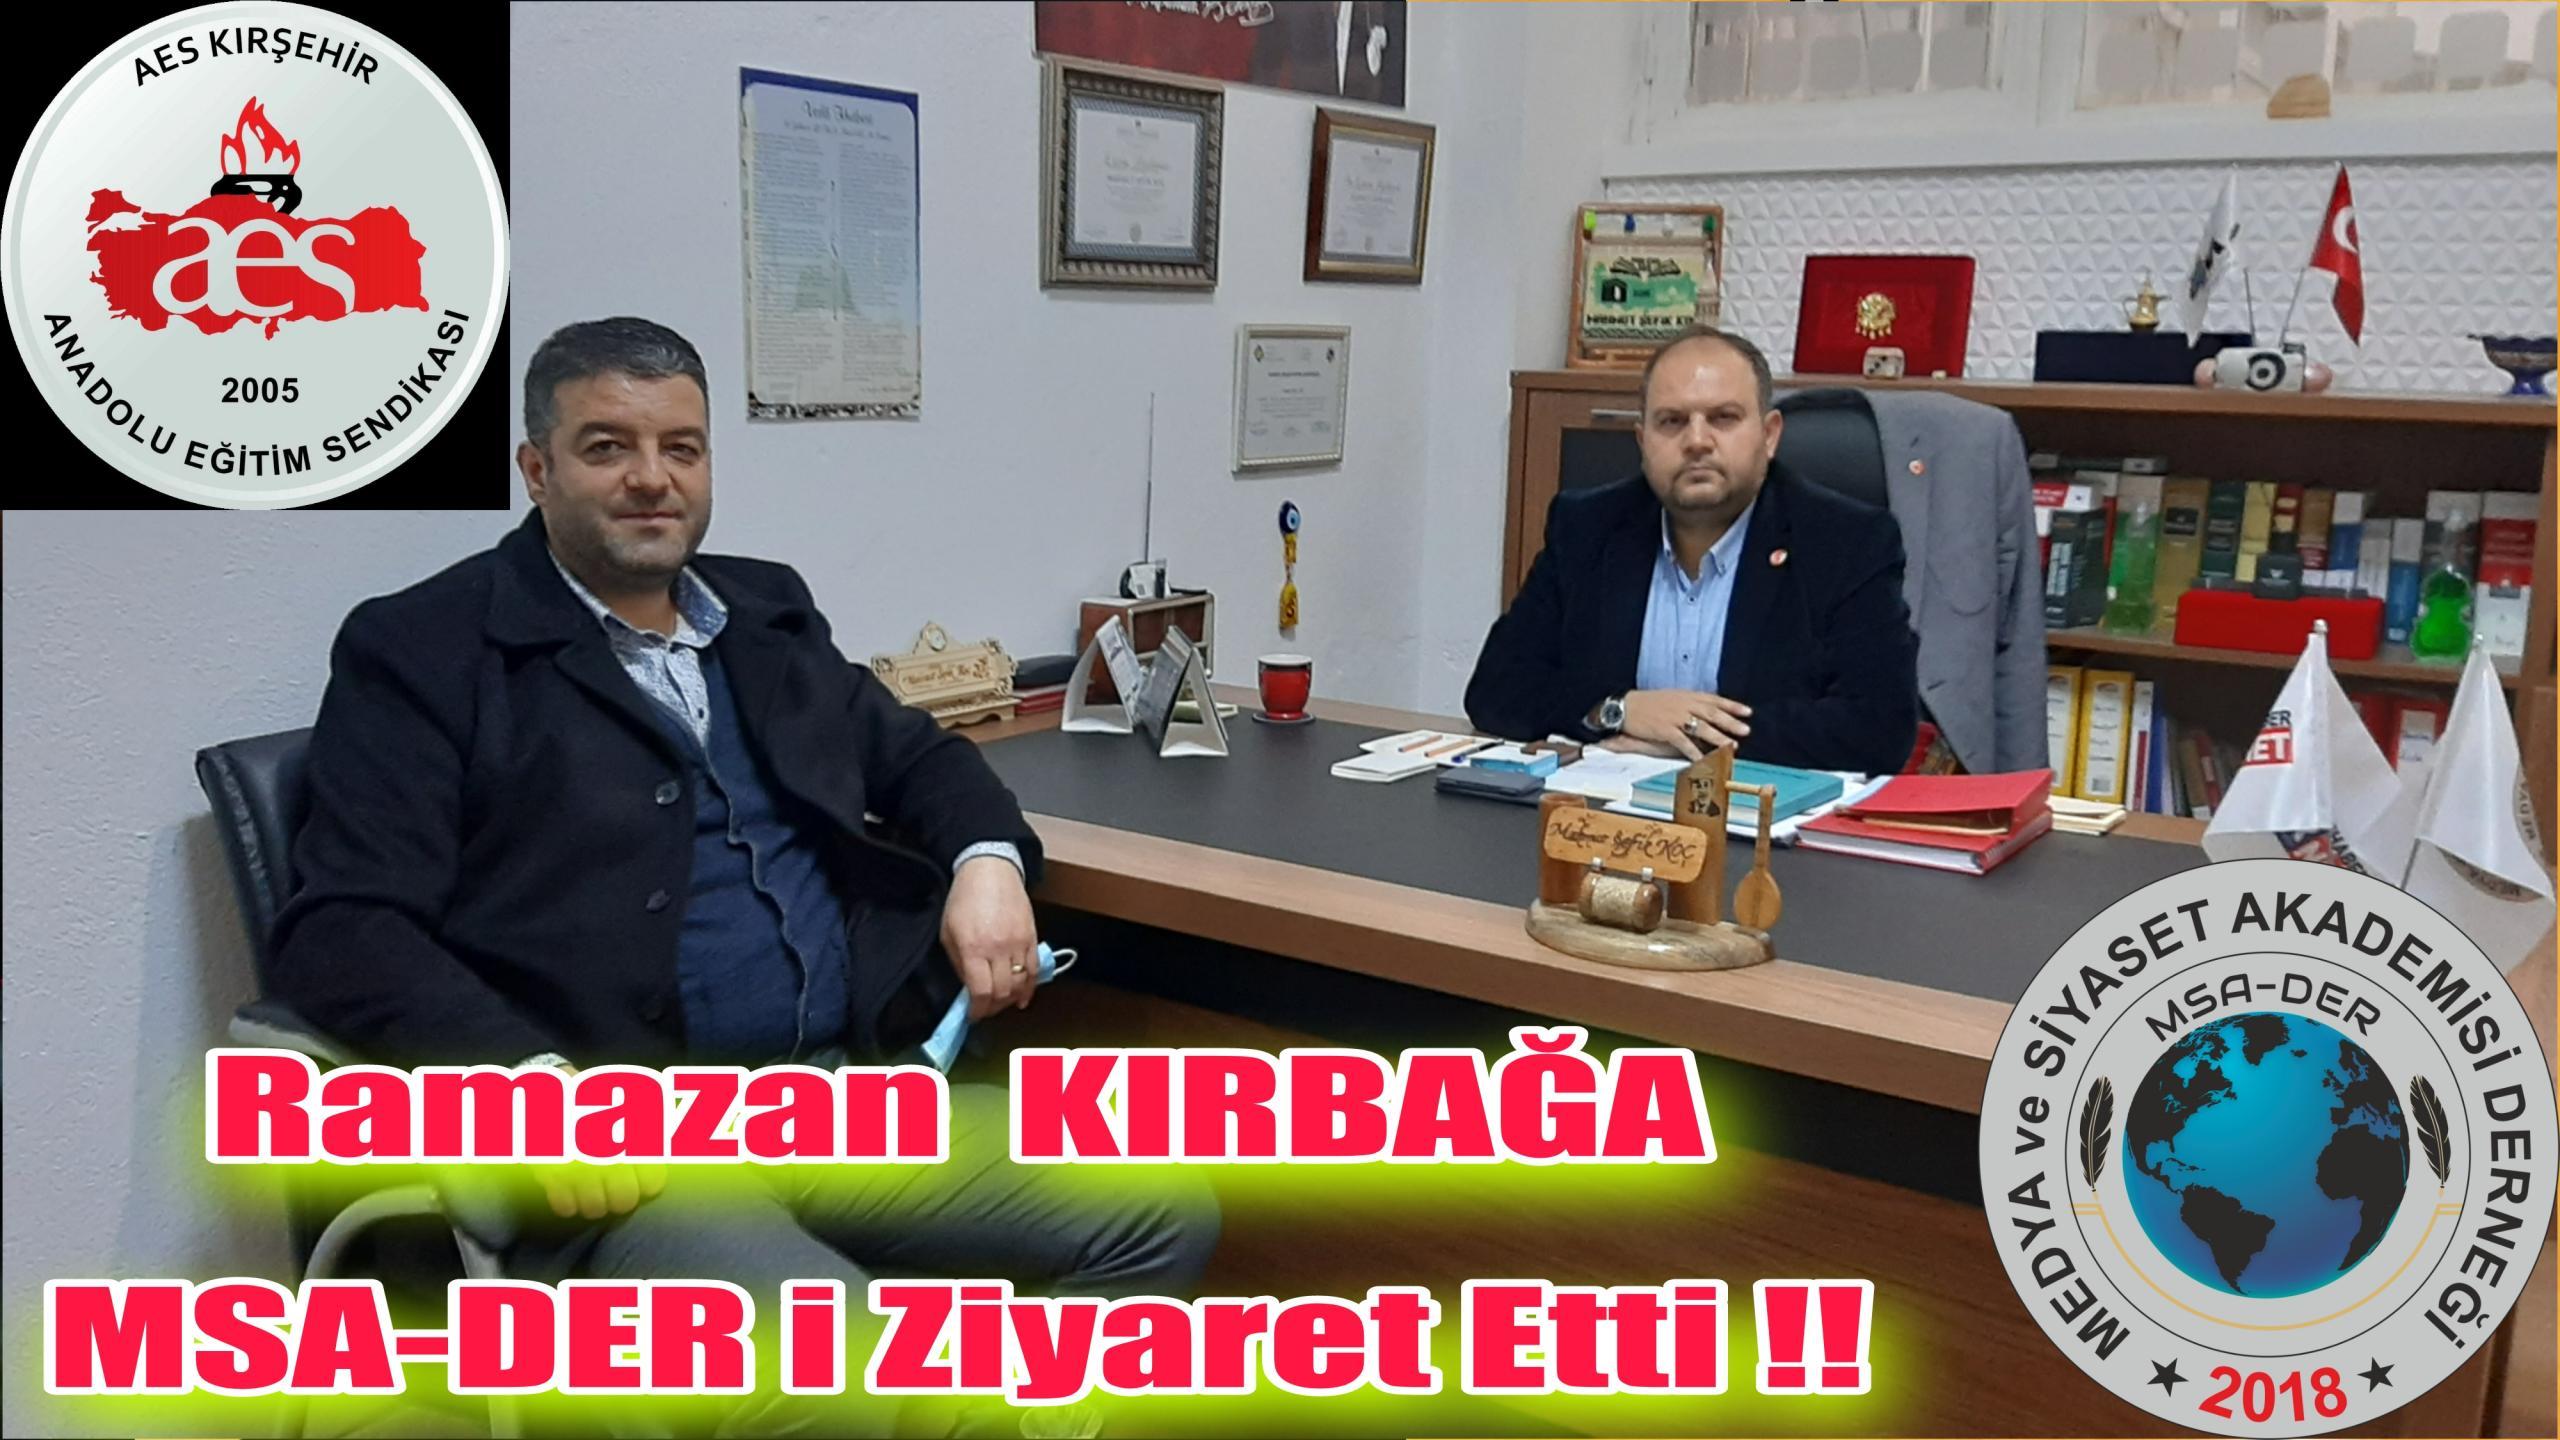 AES KIRŞEHİR ŞUBE BAŞKANI ZİYÂRETİ !!